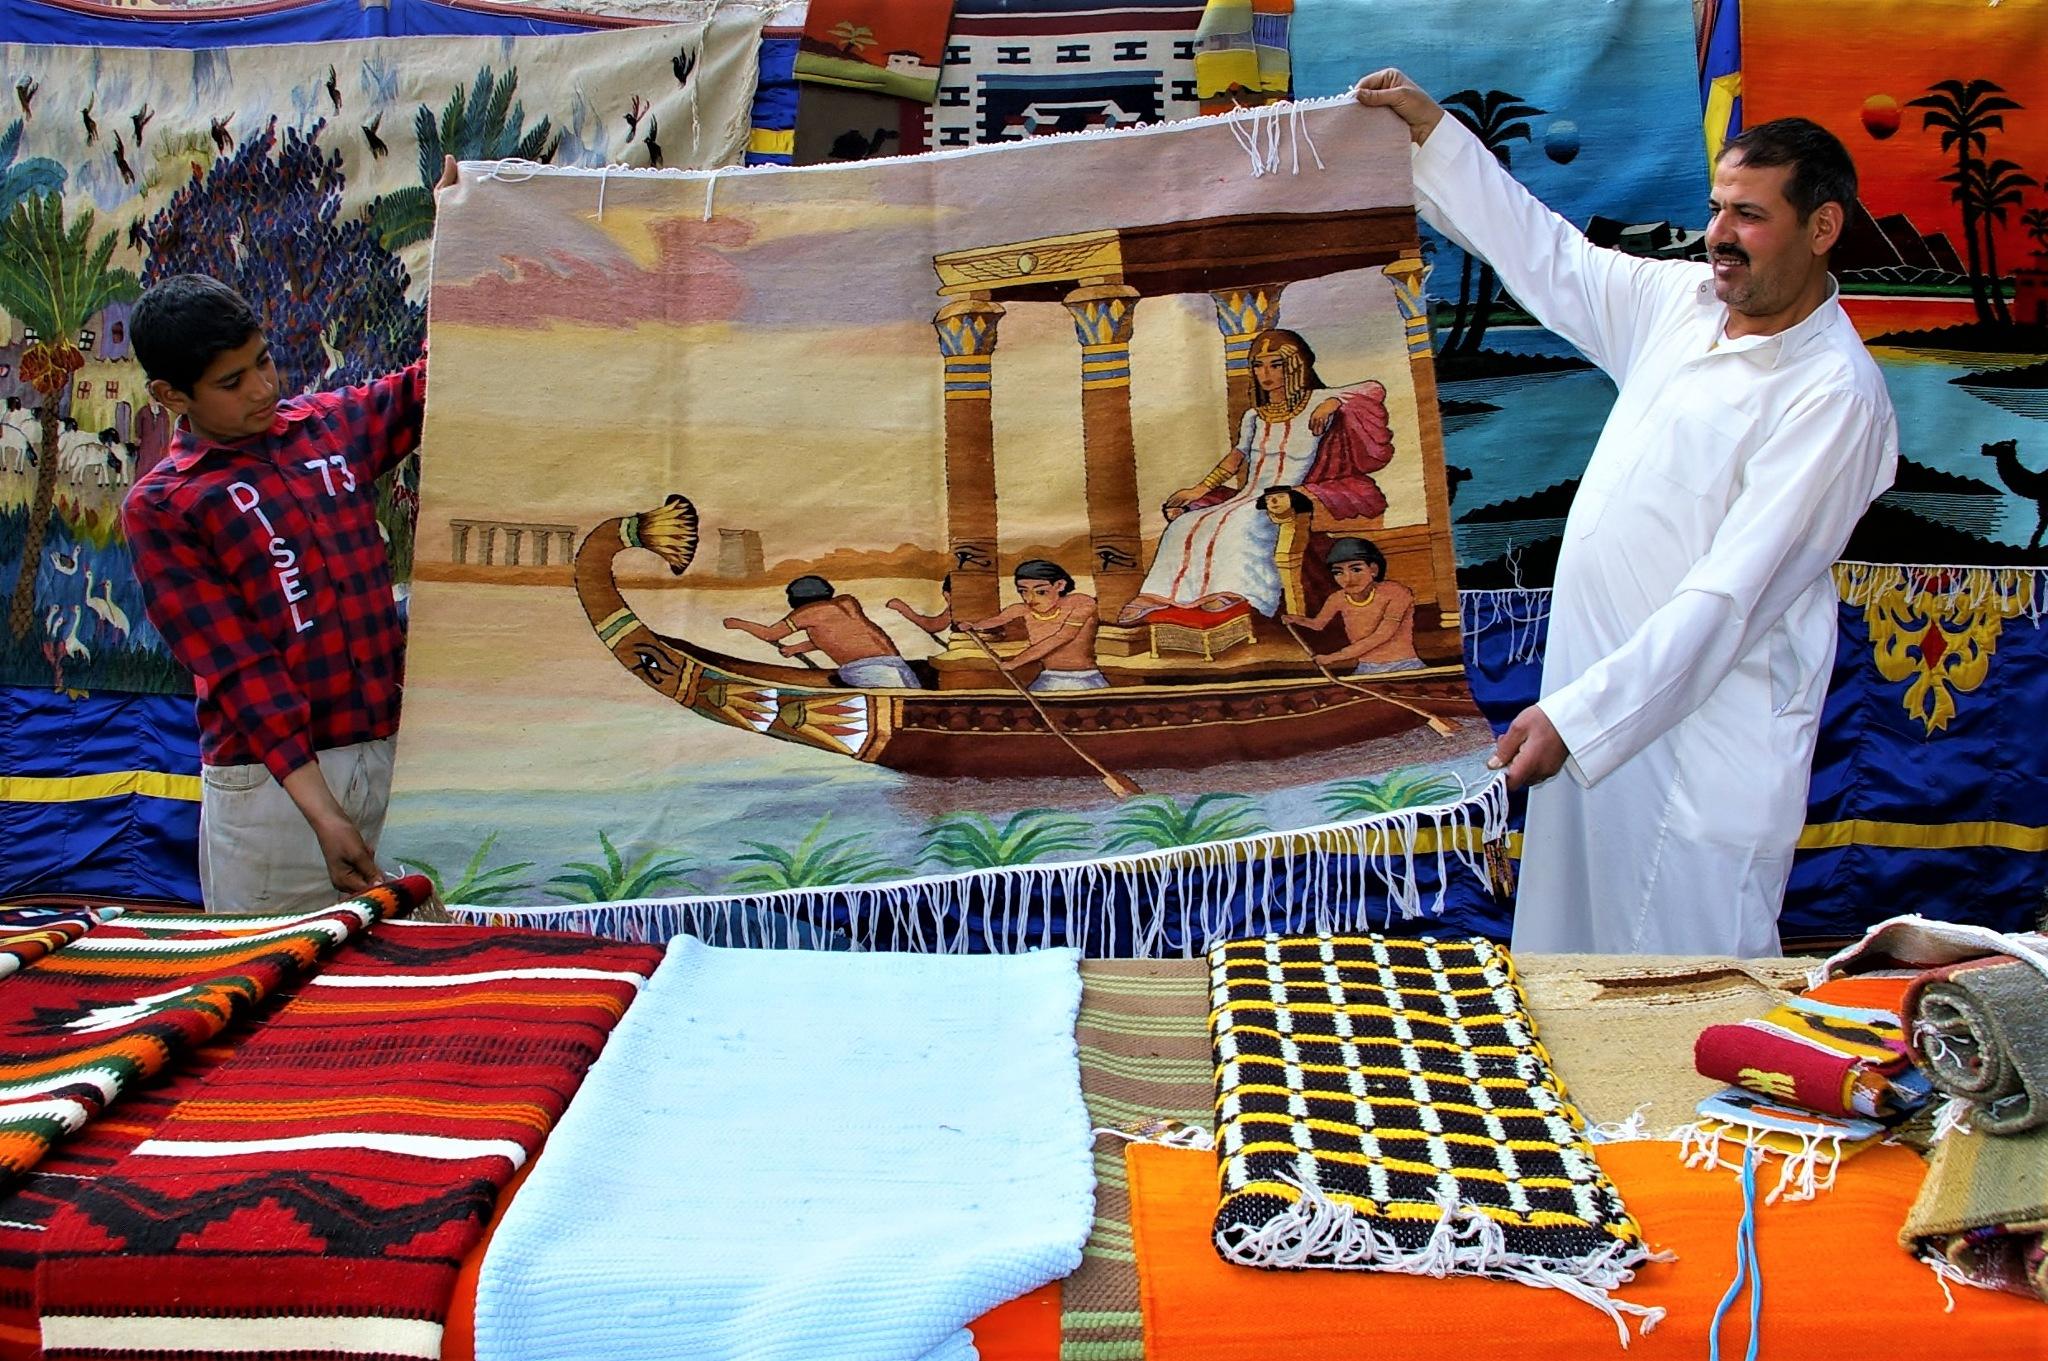 Hand-made Art by Khaled Hashem Radwan Mohamed